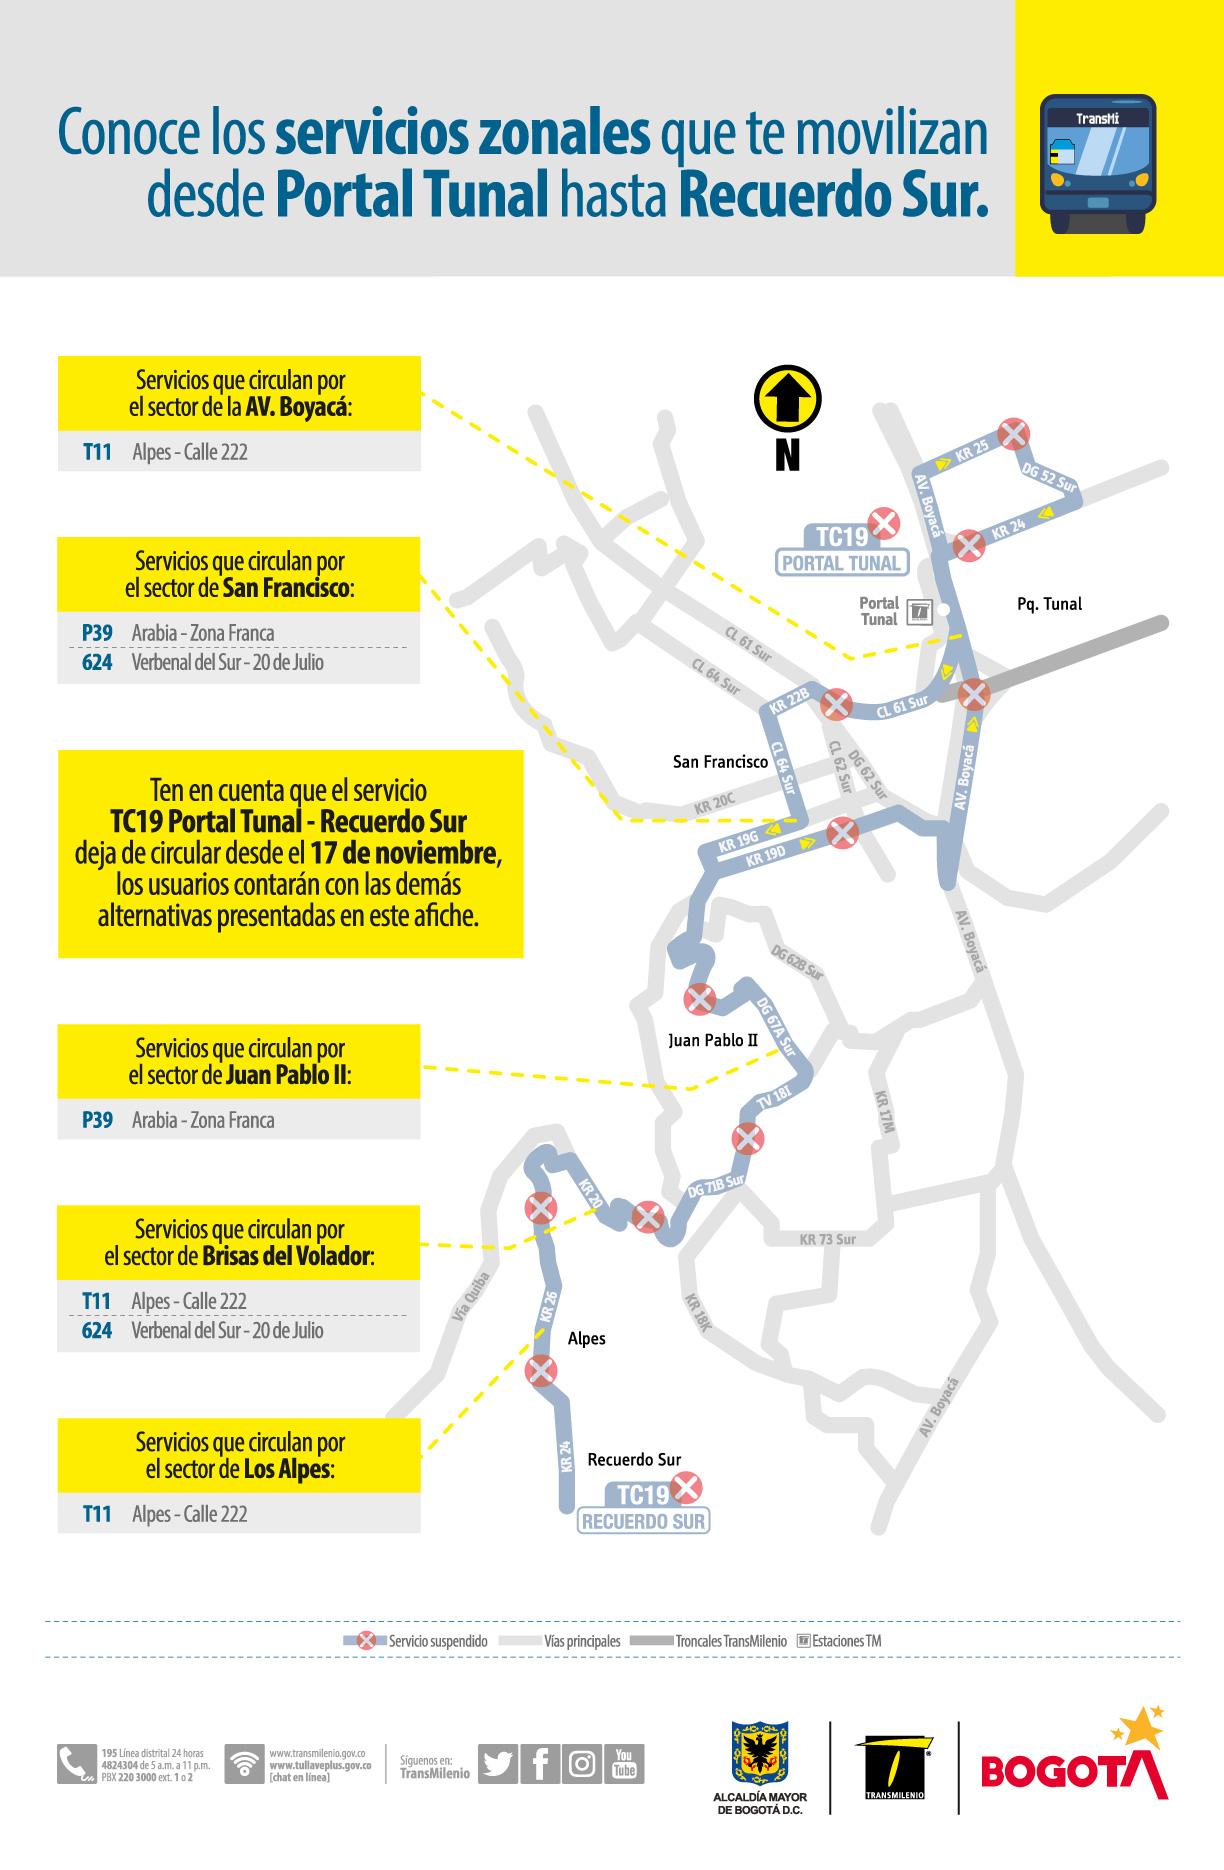 TC19 Portal Tunal - Recuerdo Sur( Deja de circular)